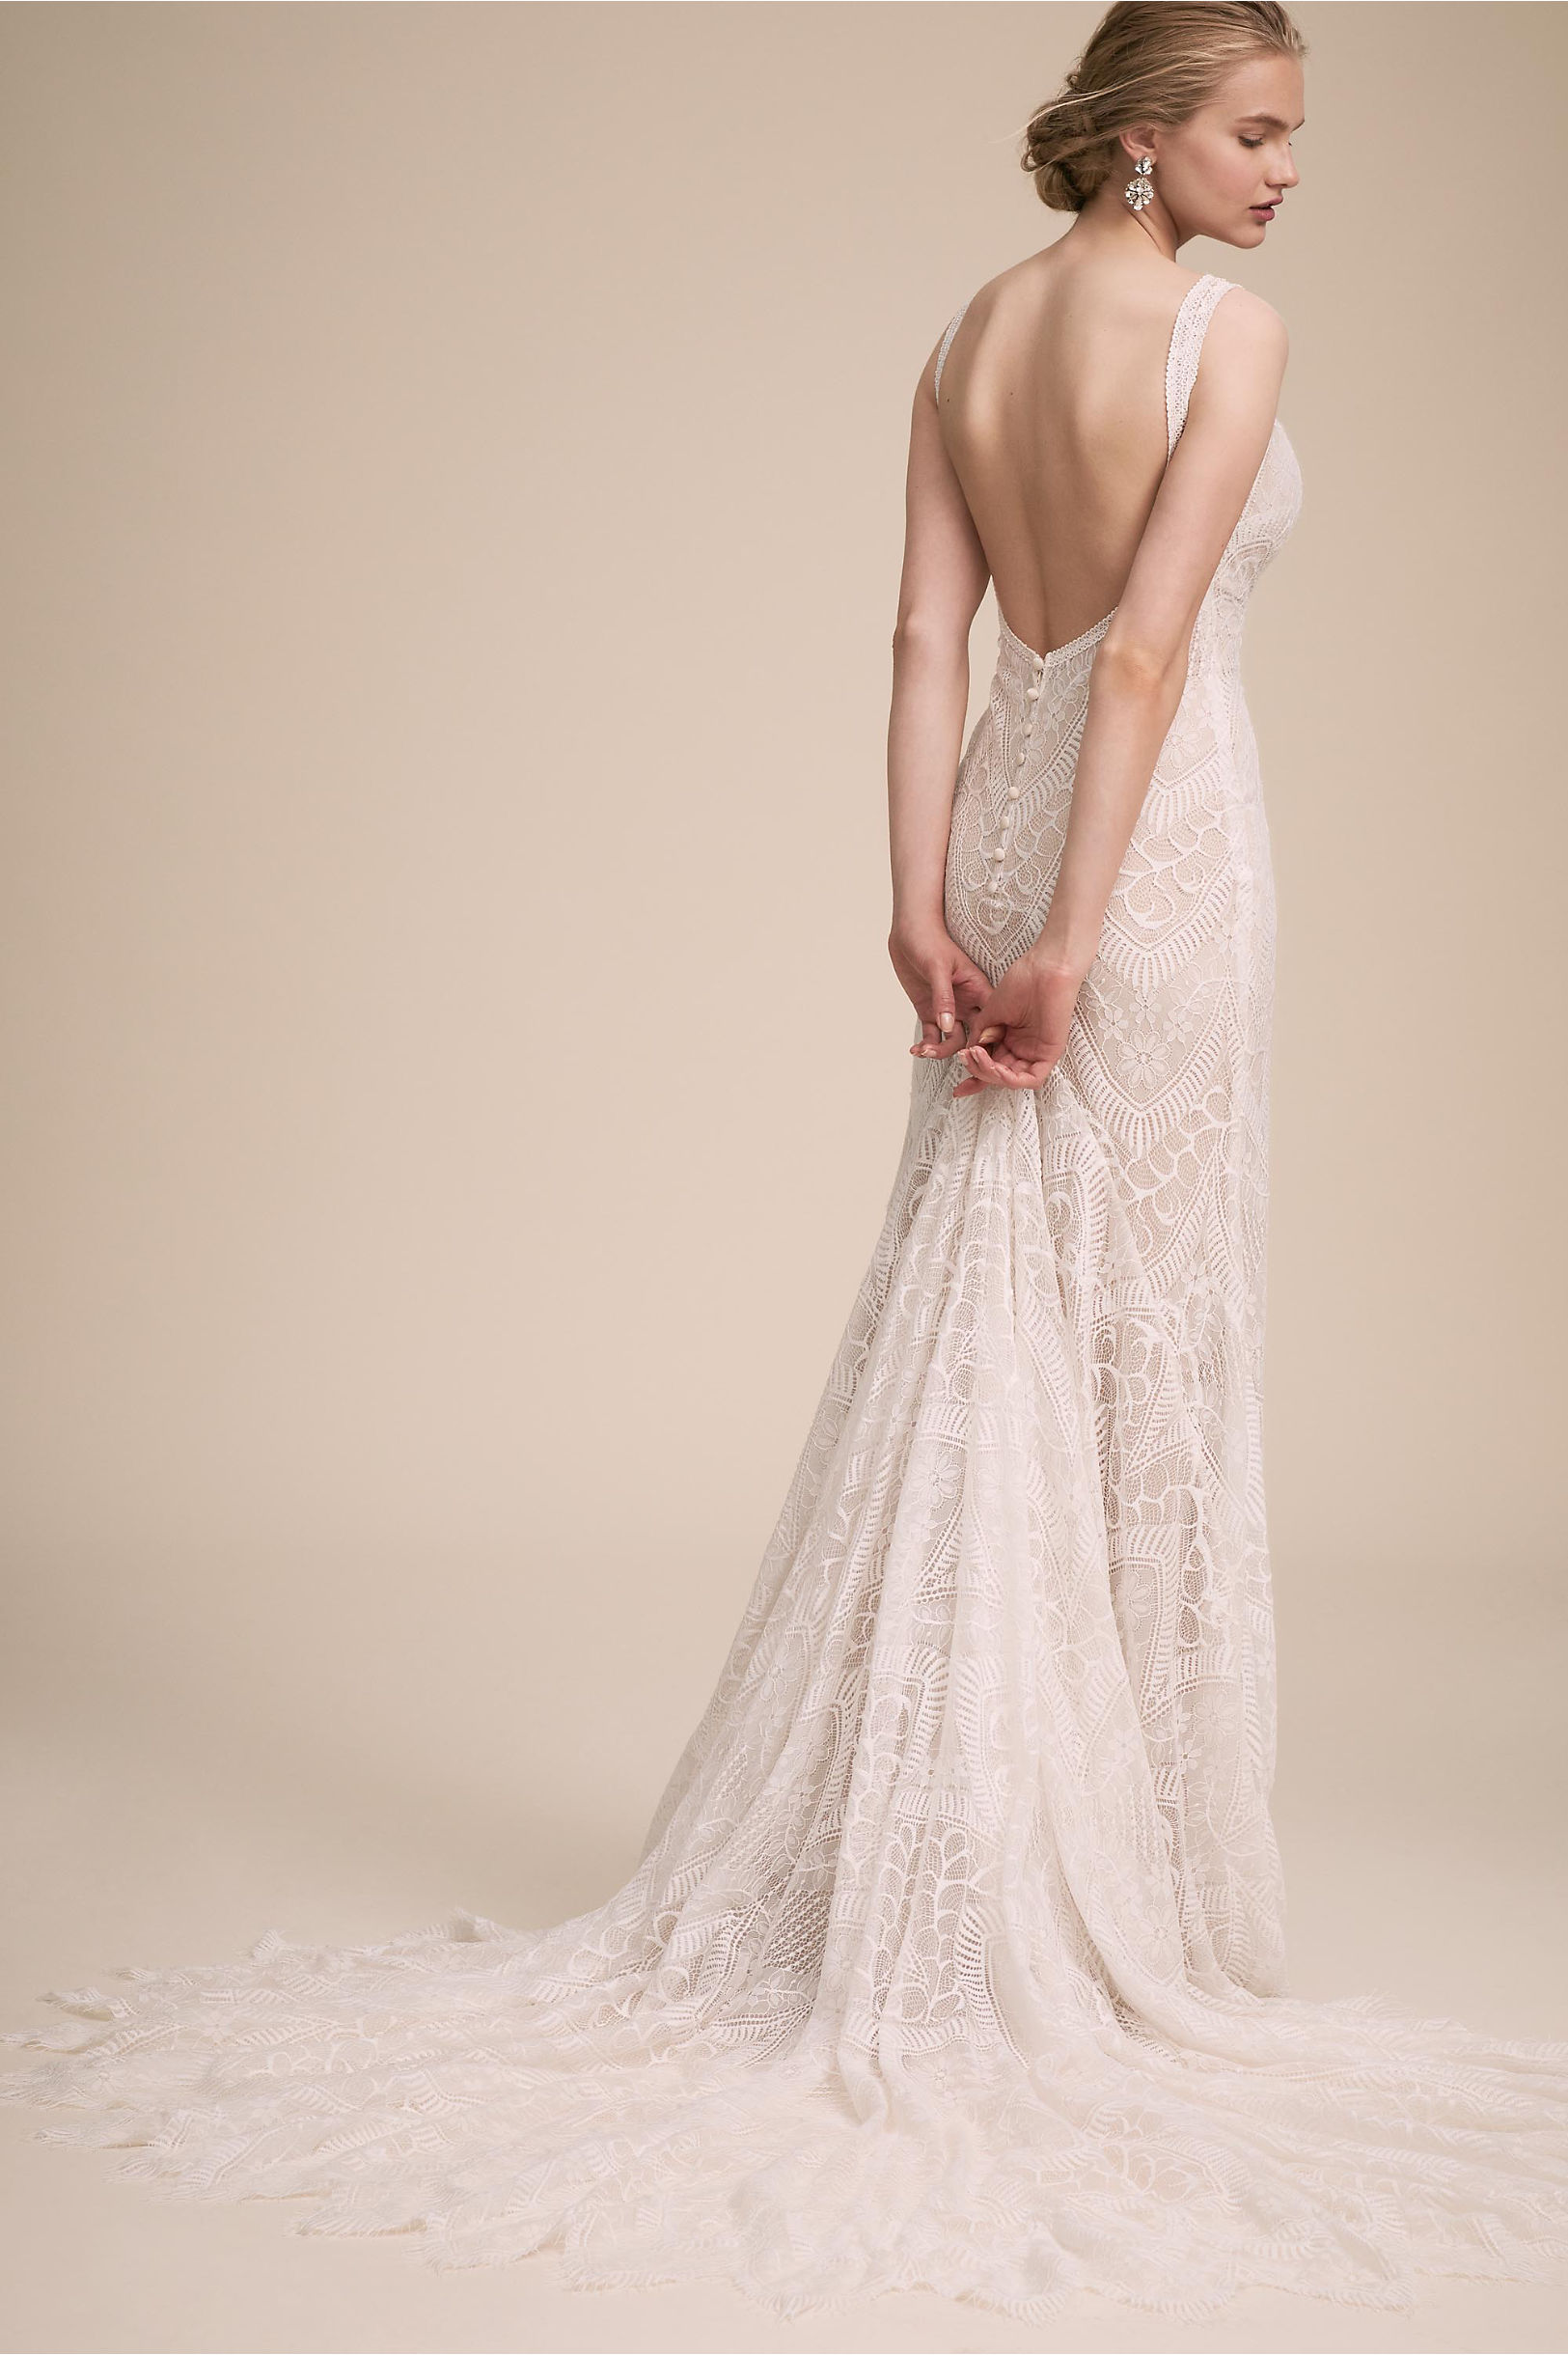 Vintage Style Wedding Dresses, Vintage Inspired Wedding Gowns Love Note Gown  AT vintagedancer.com